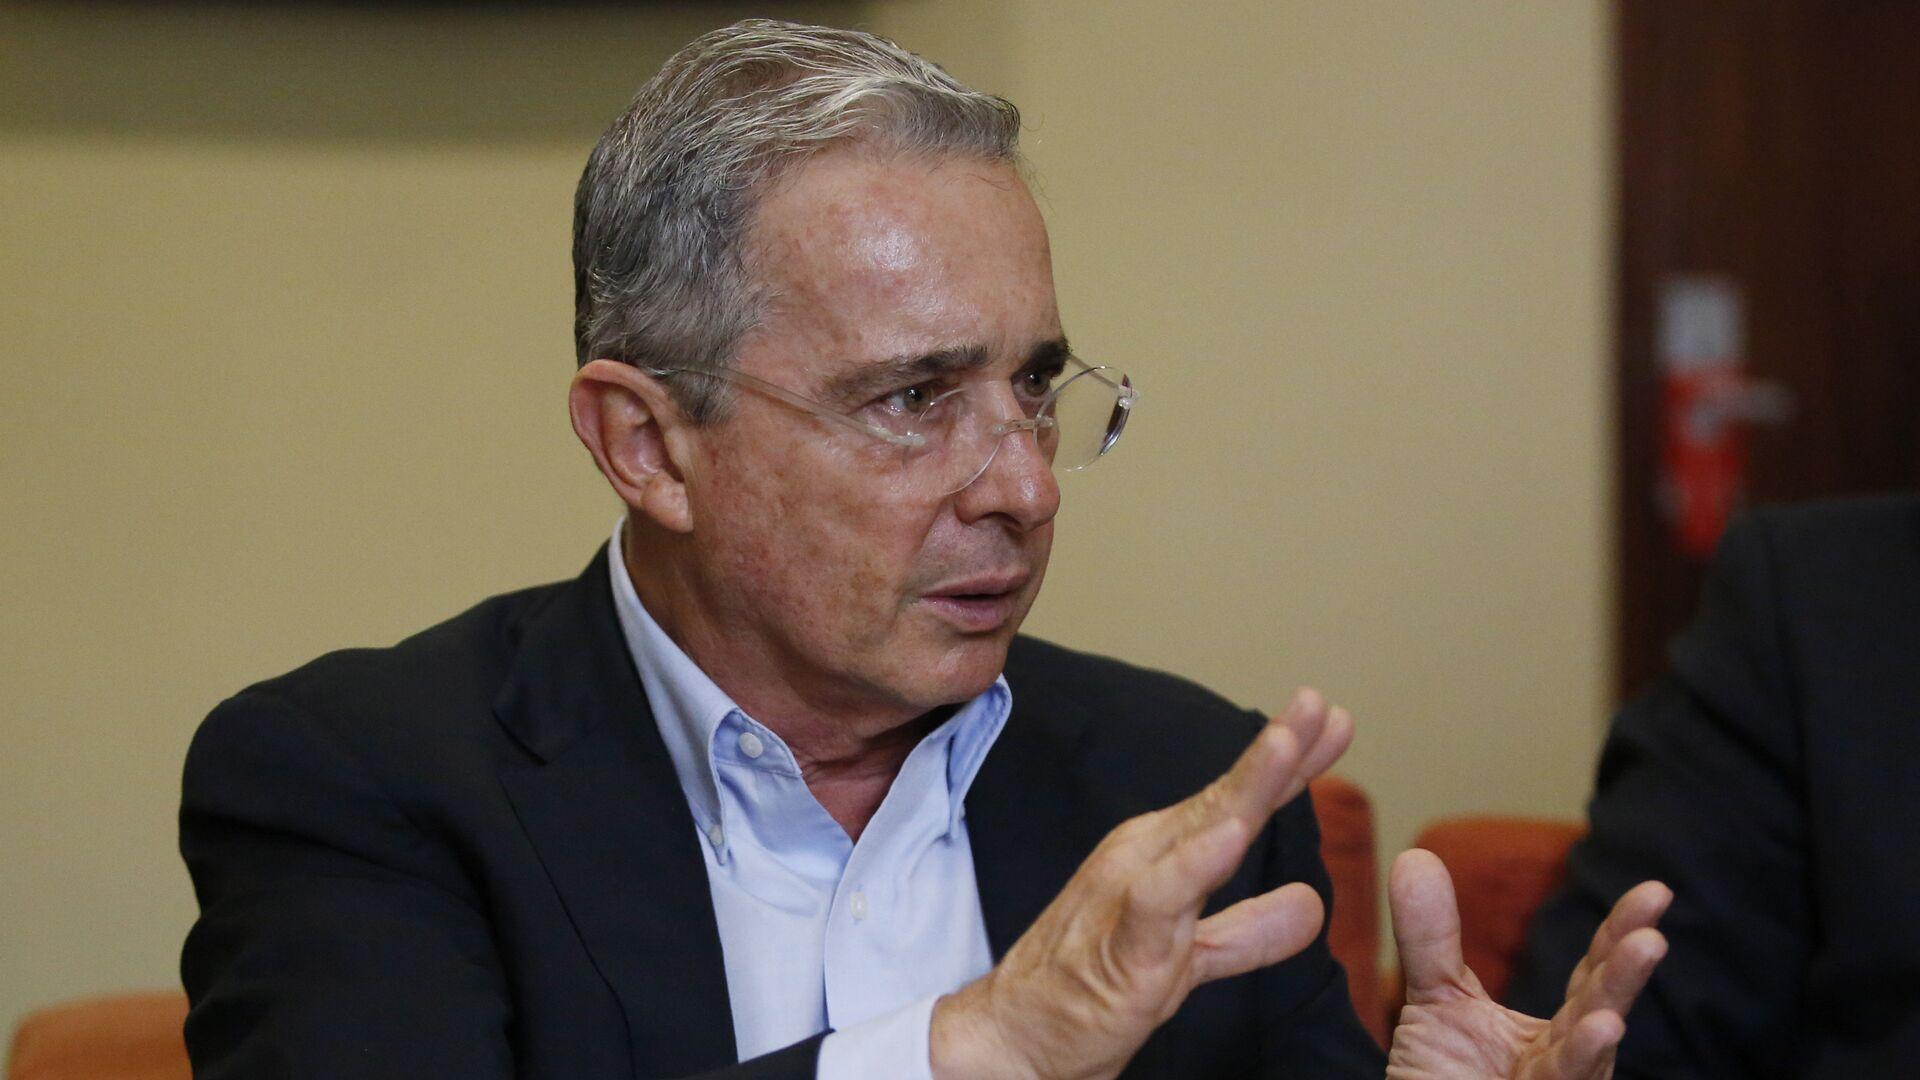 Álvaro Uribe Vélez, expresidente de Colombia - Sputnik Mundo, 1920, 25.08.2021